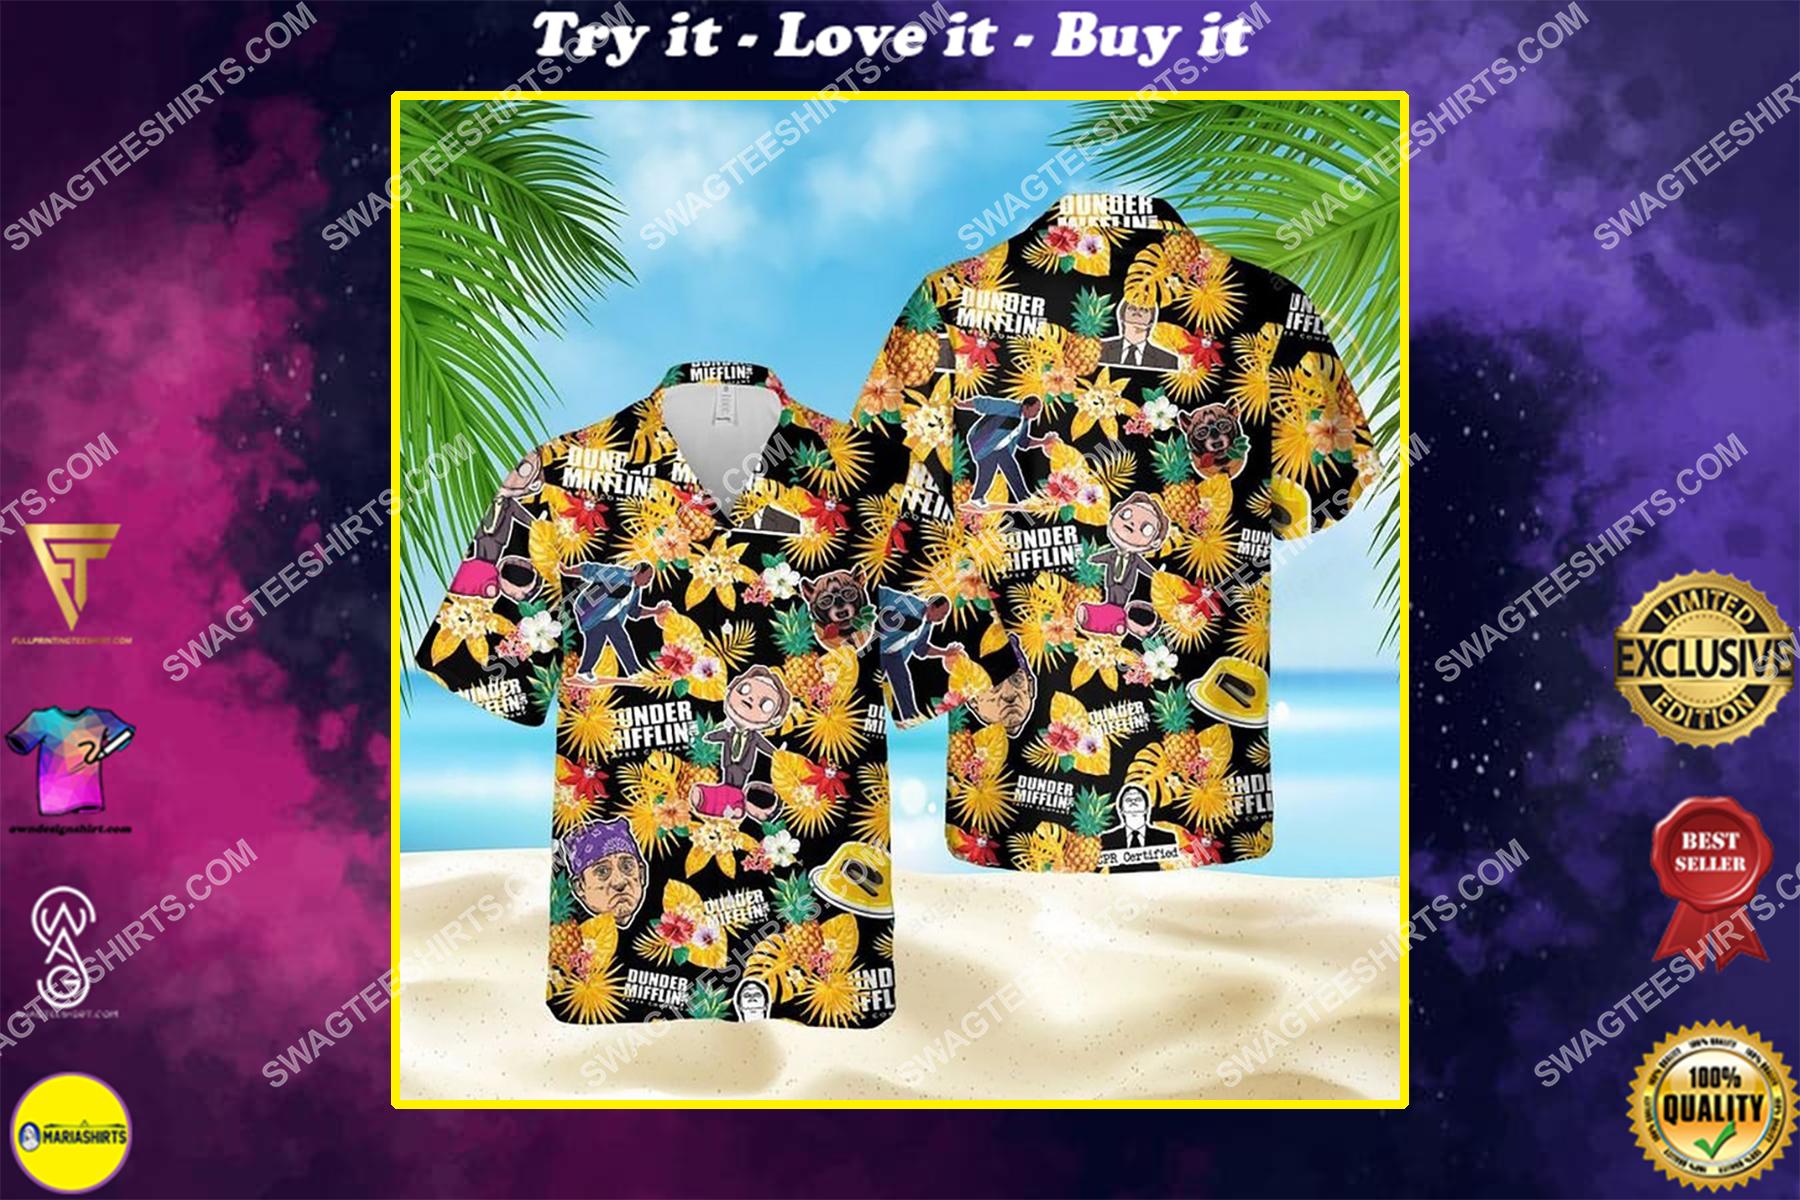 Dunder mifflin paper company the office tv show hawaiian shirt